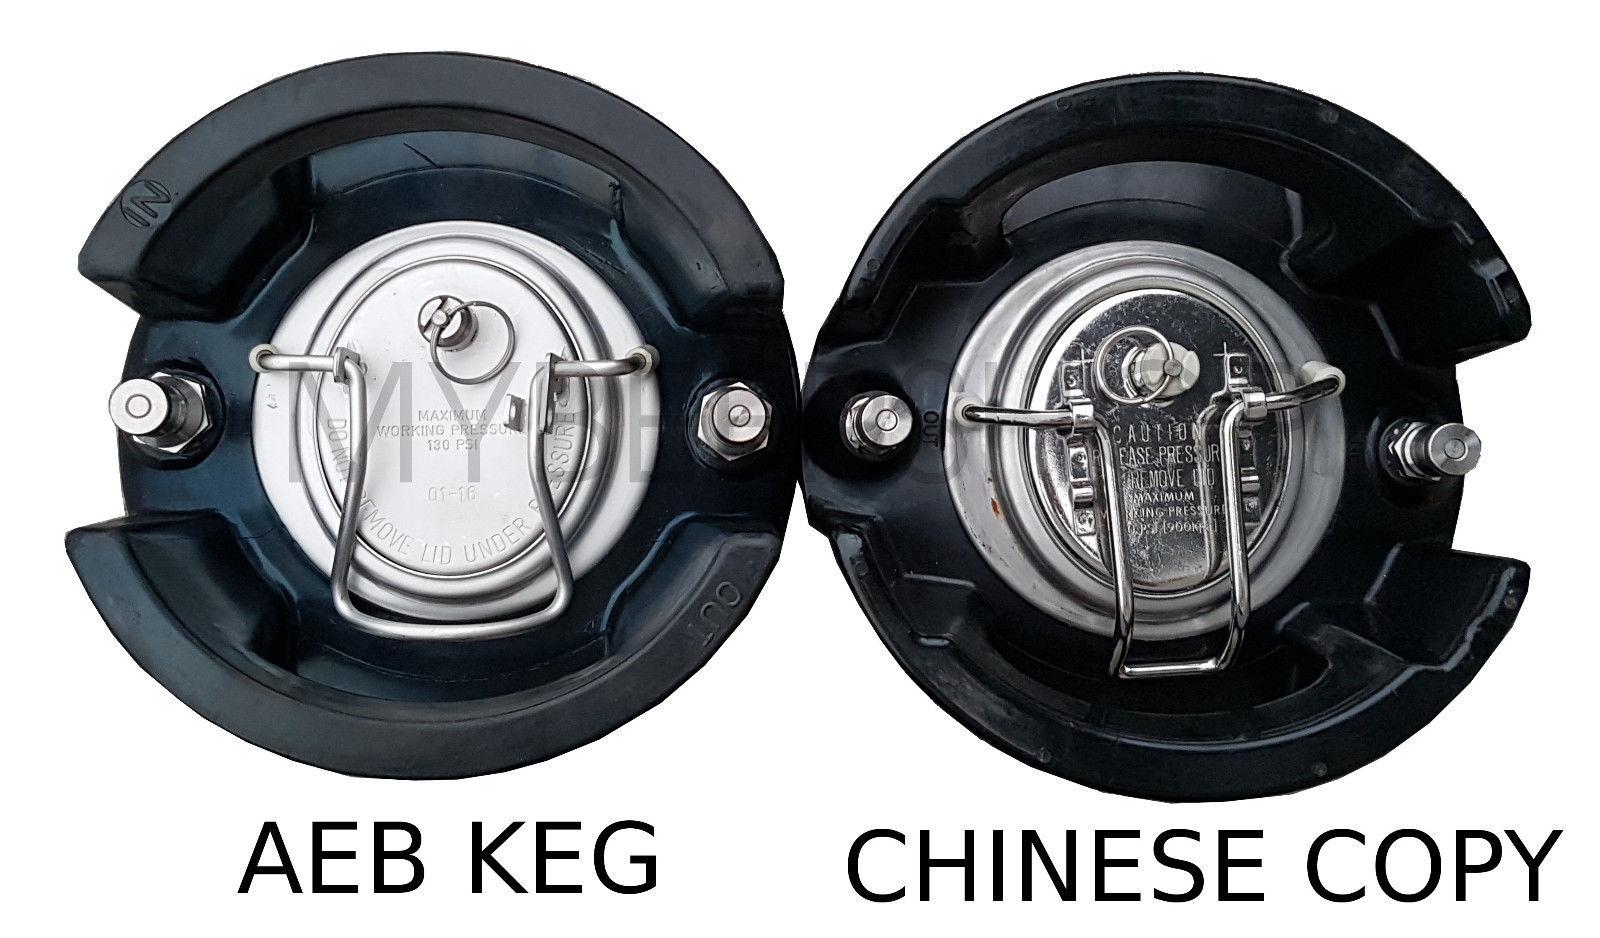 Basic Ball Lock Homebrew Kegging Kit with 3 Gallon